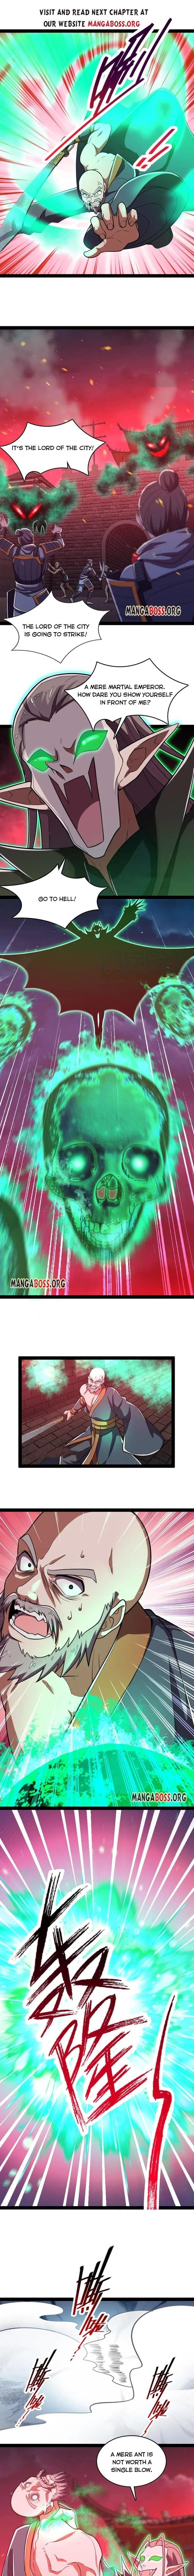 Life Of A War Emperor After Retirement Chapter 64 page 1 - Mangakakalots.com